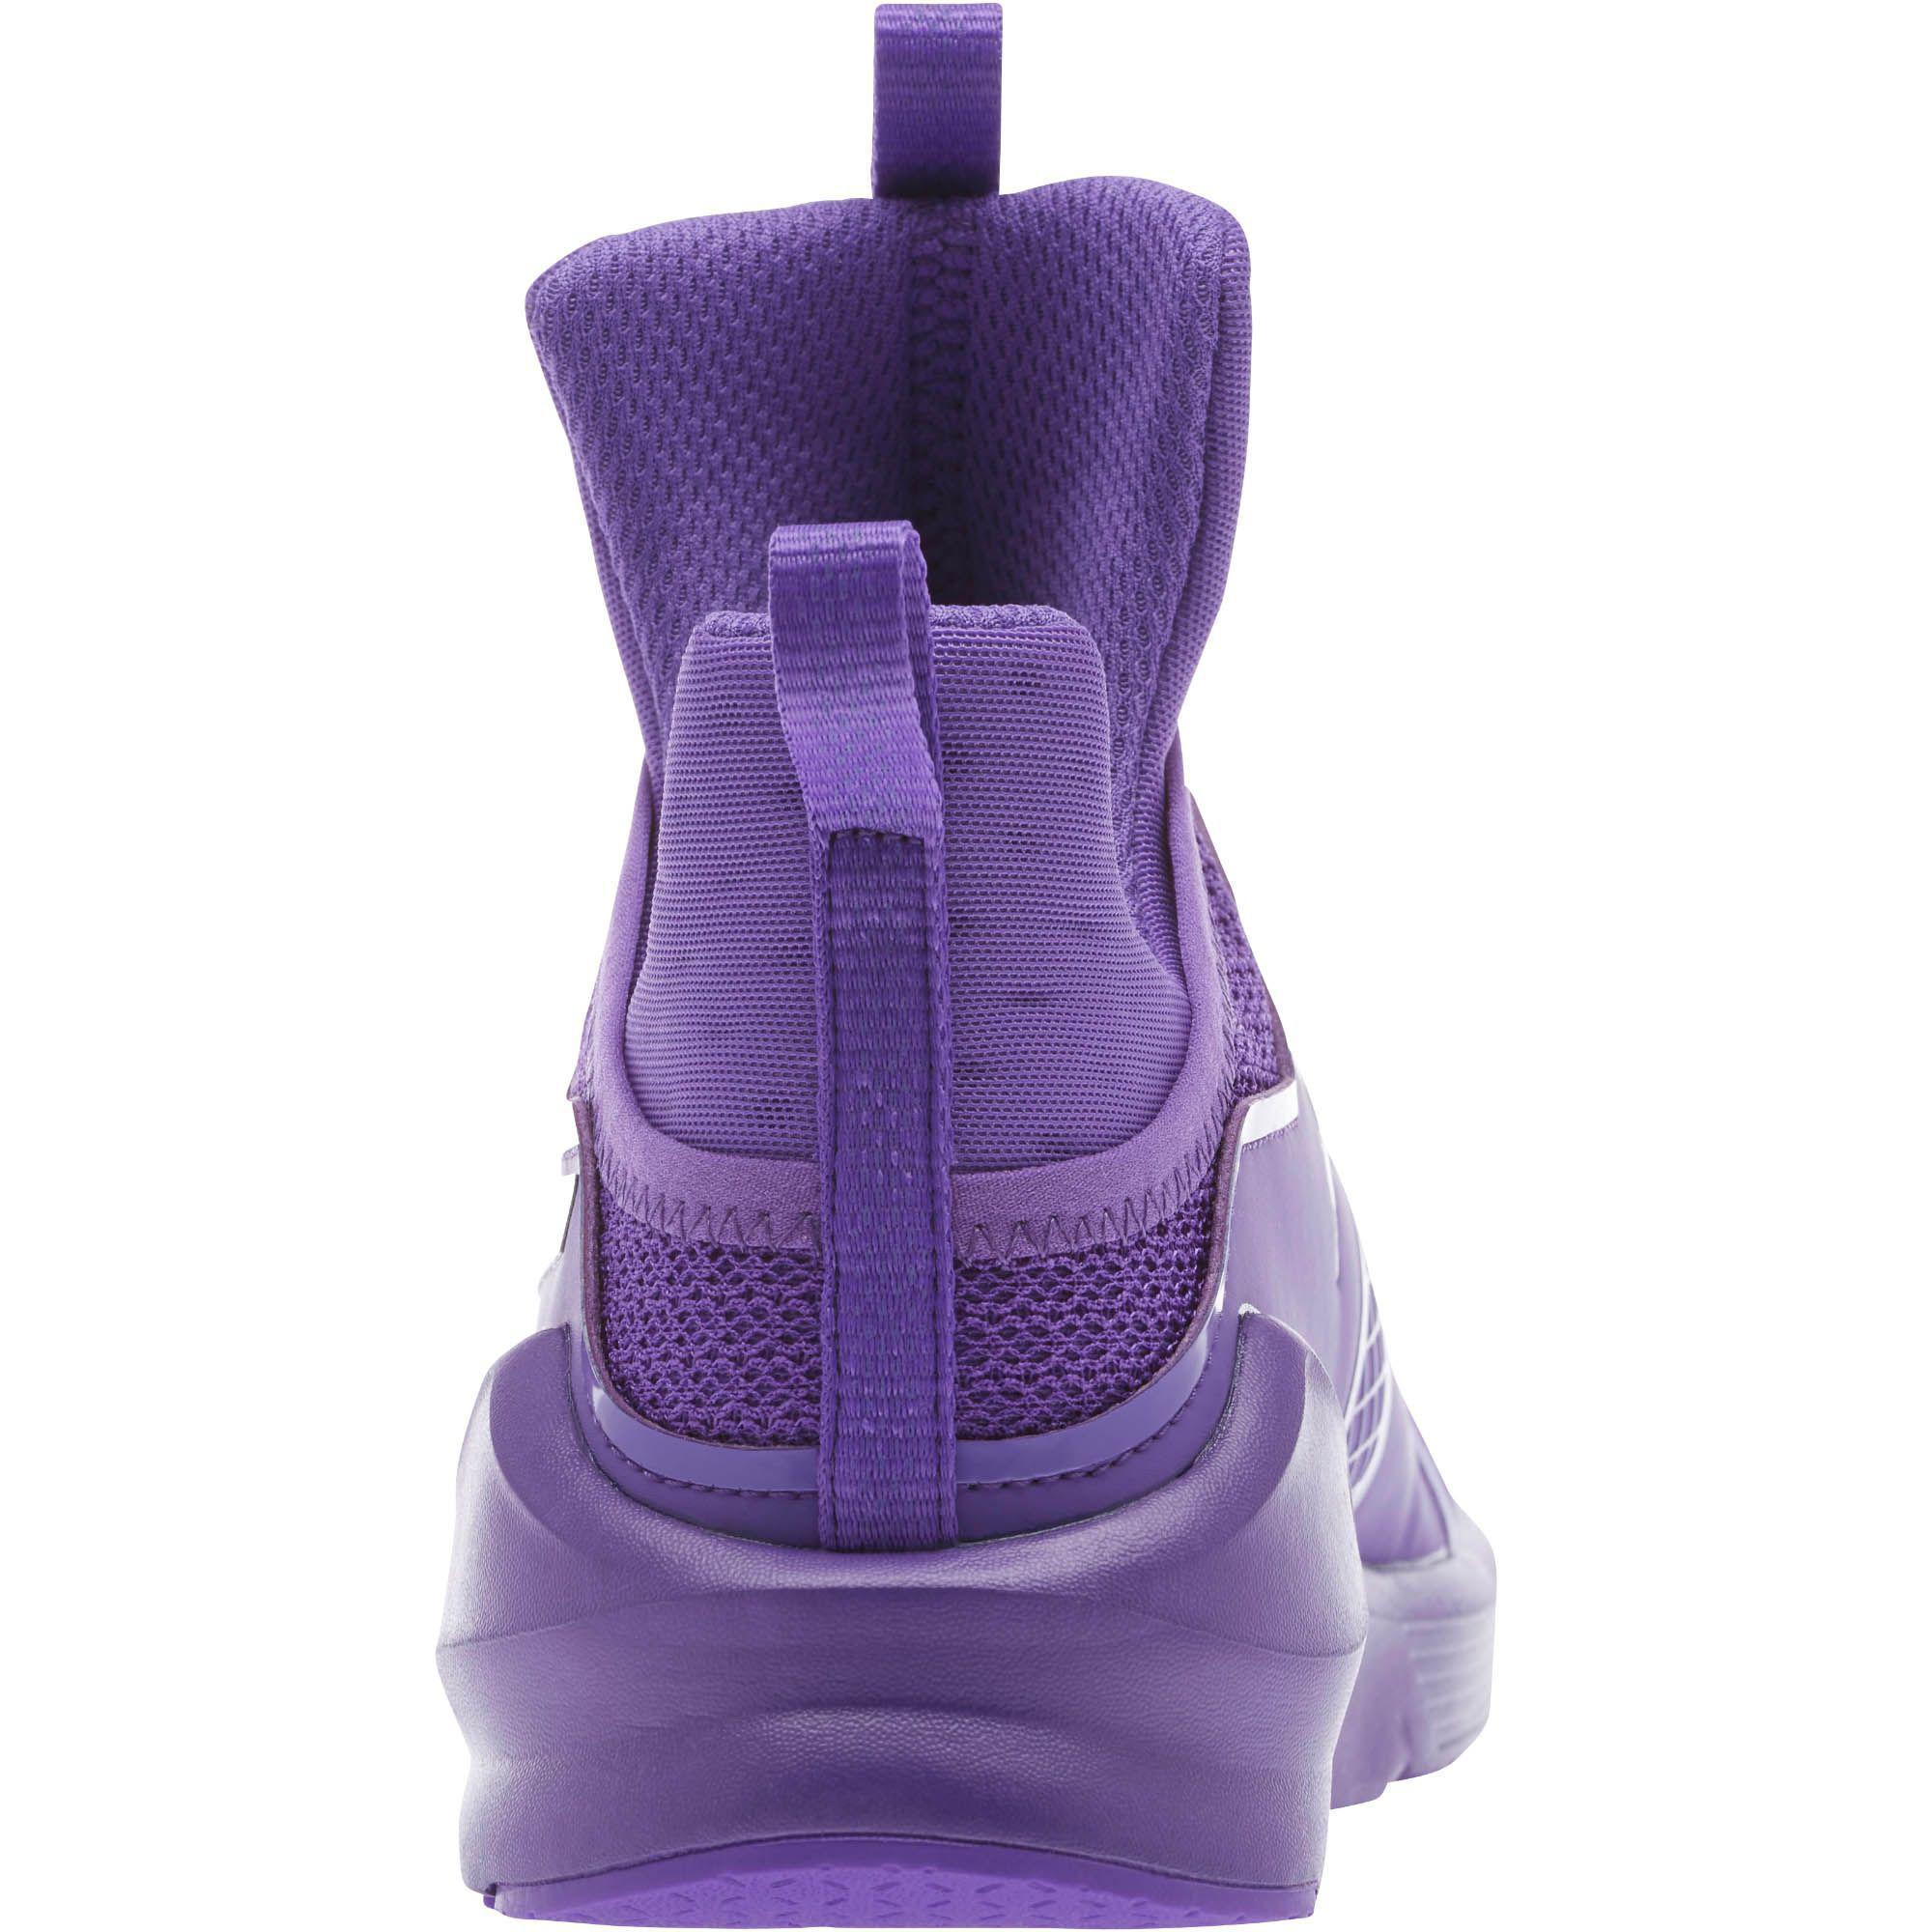 Lyst - PUMA Fierce Culture Surf Women s Training Shoes in Purple 23a37fa11